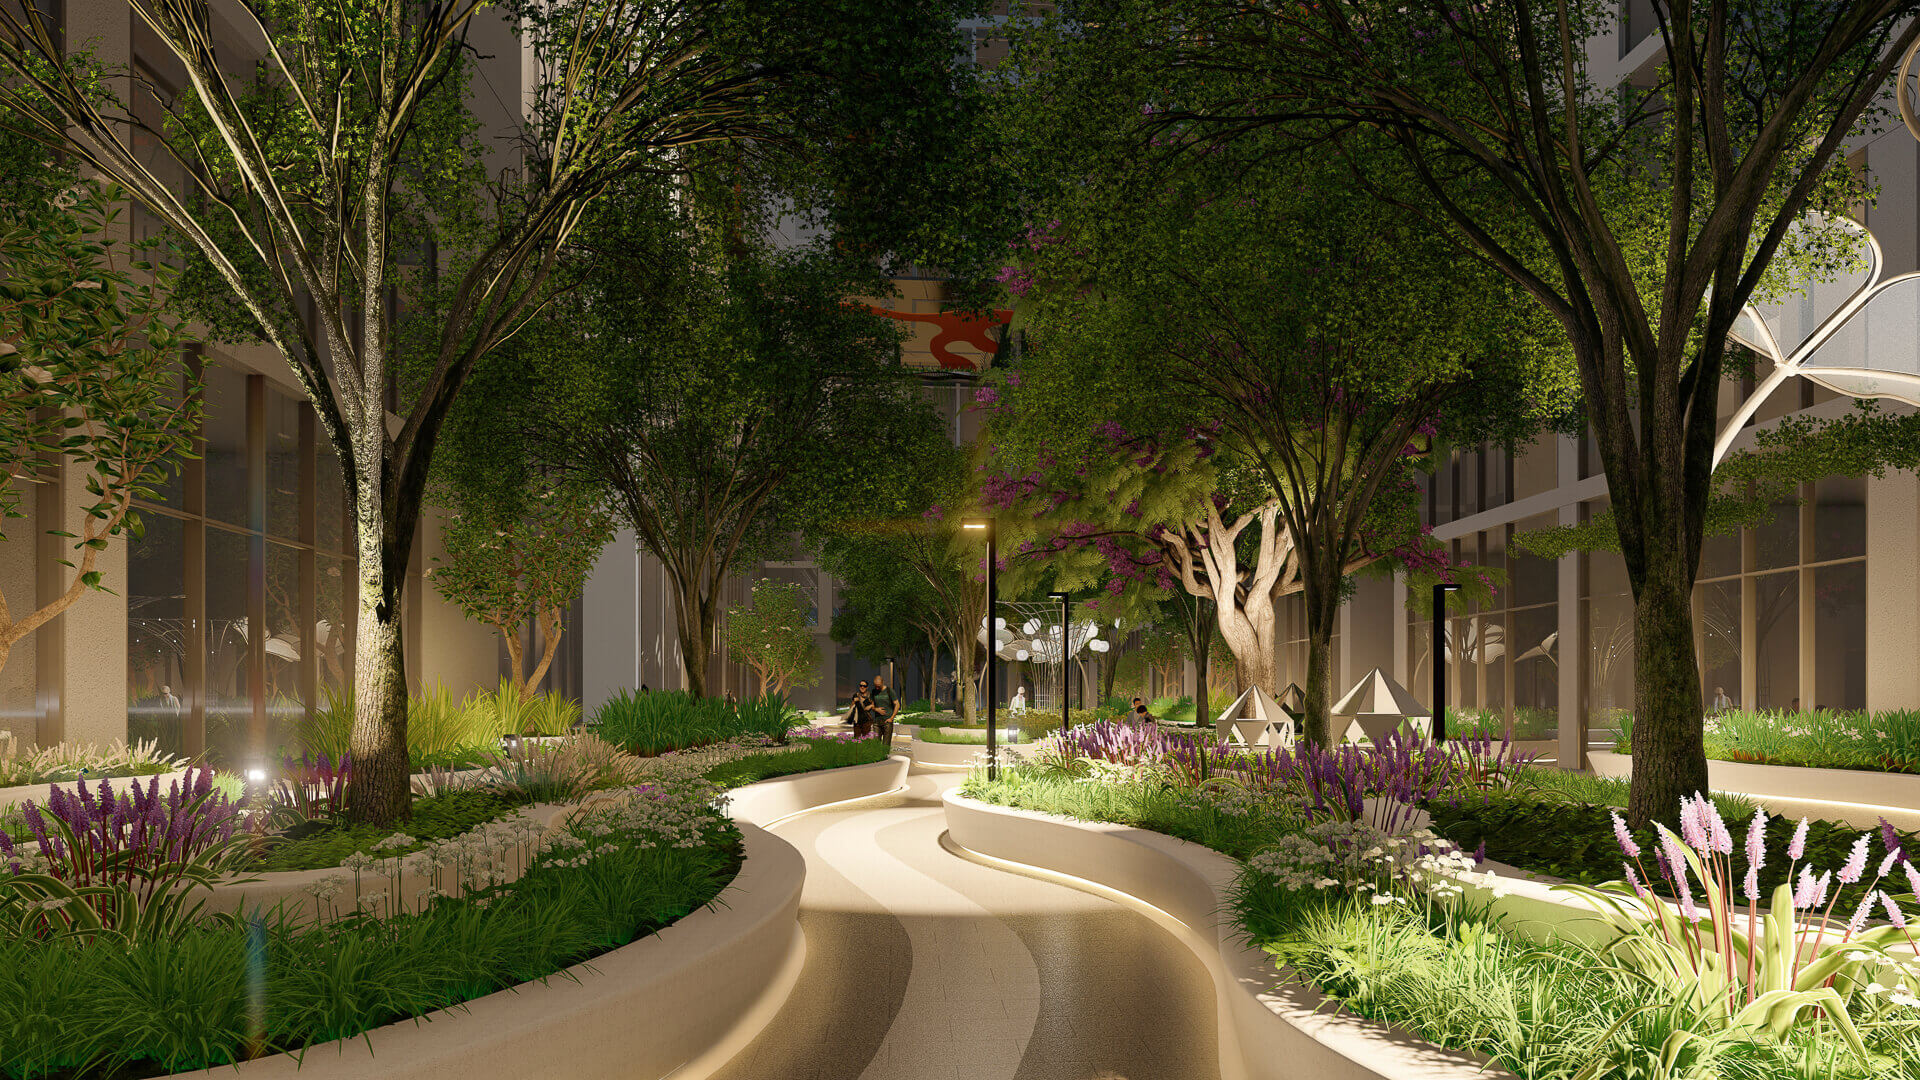 lối dạo bộ dự án the peak garden quận 7